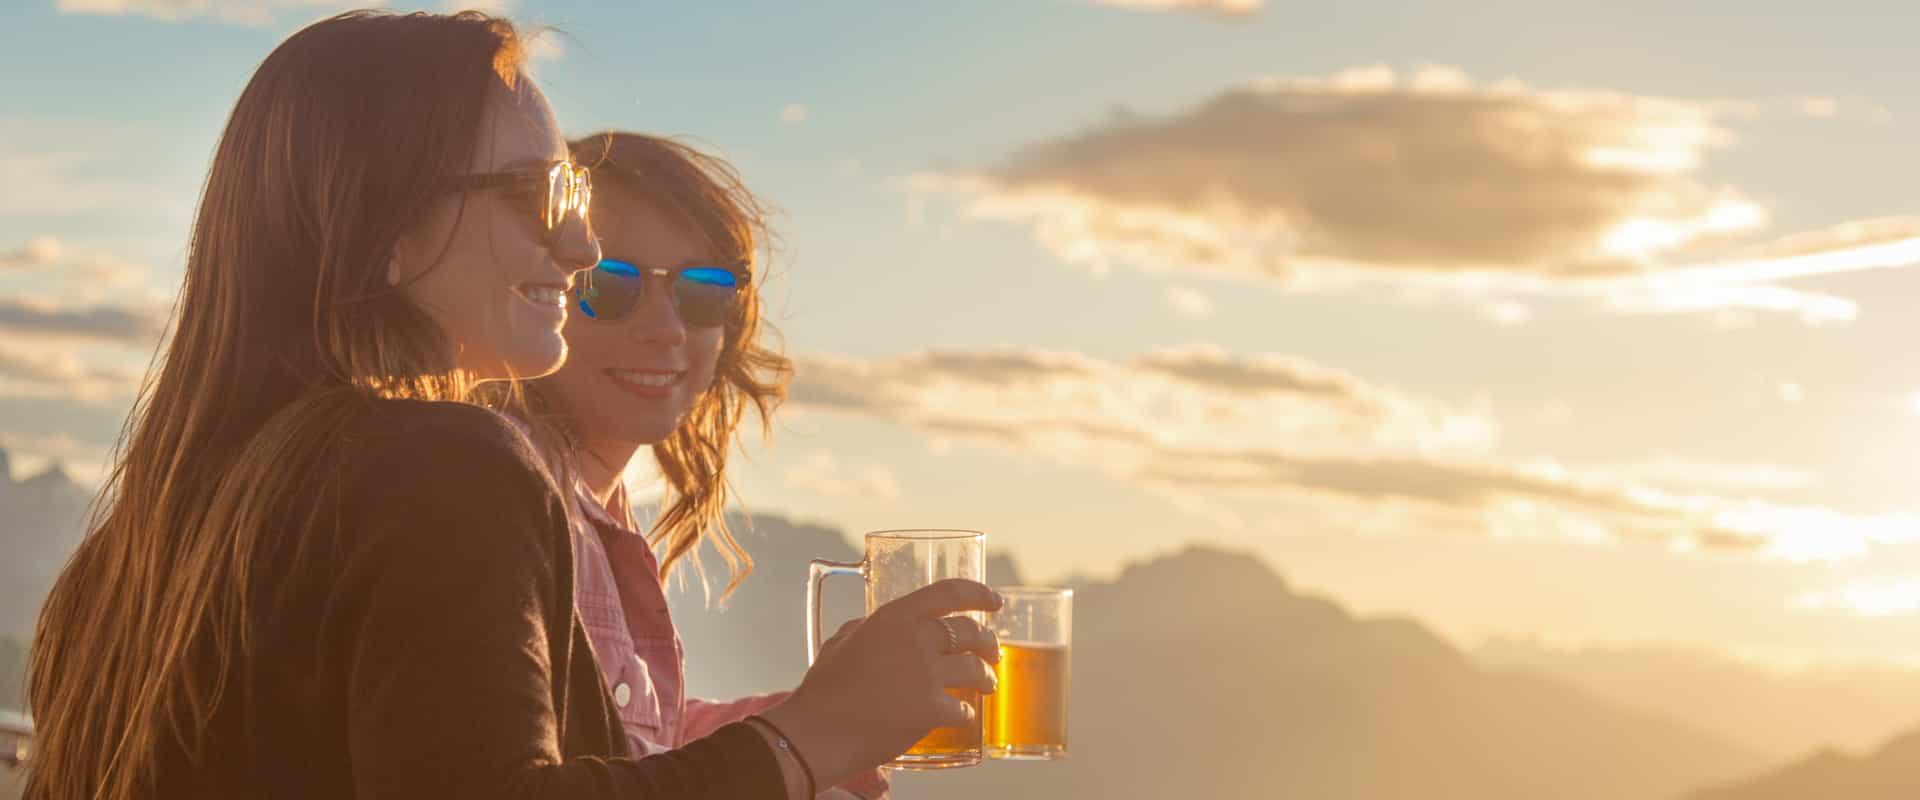 Sunset Festival at the Banff Gondola